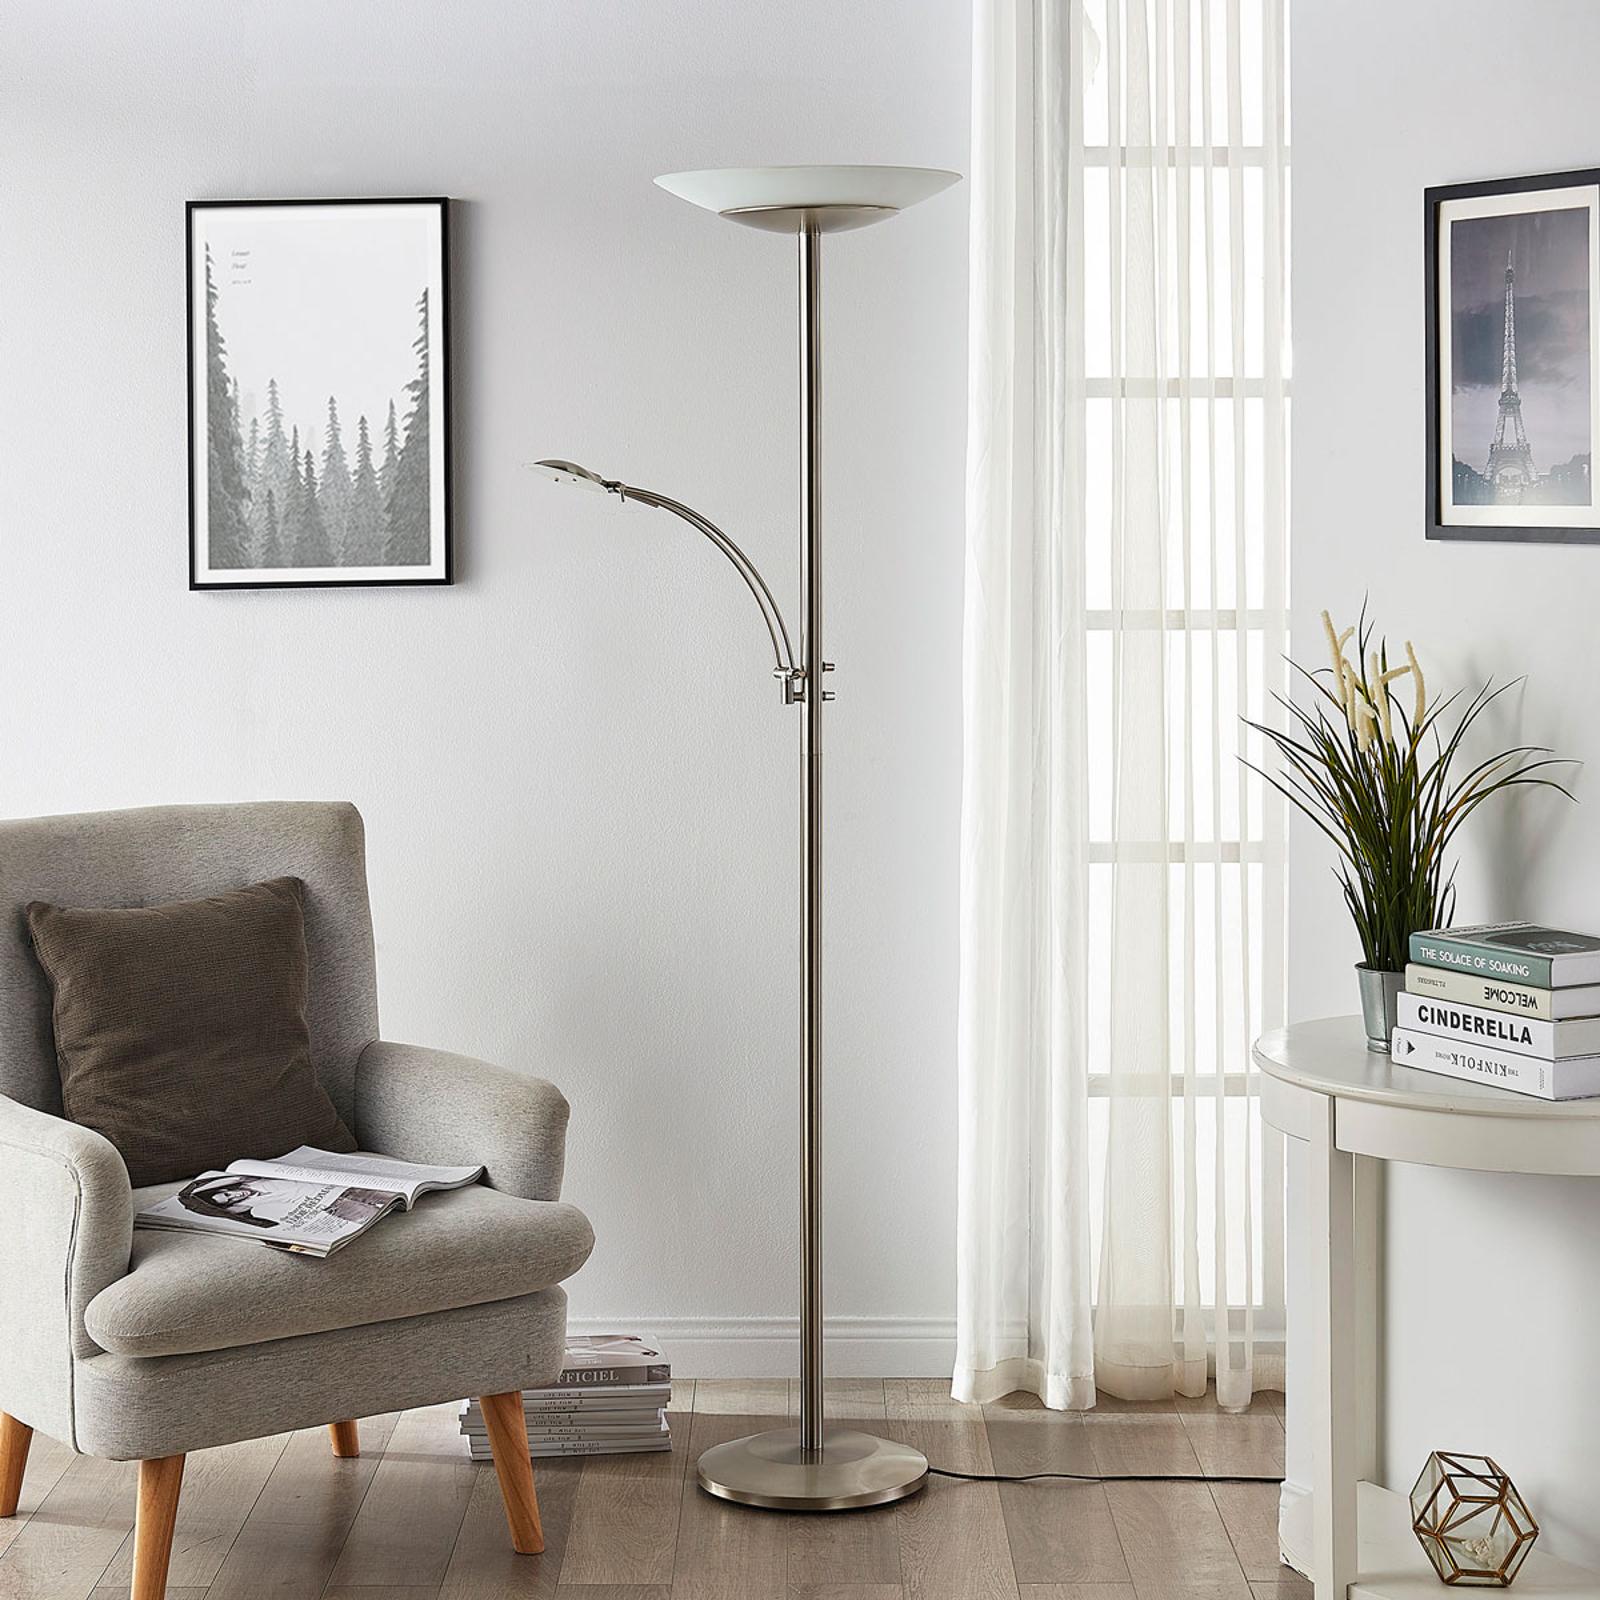 Ilinca - lampadaire LED indirect dimmable et lampe